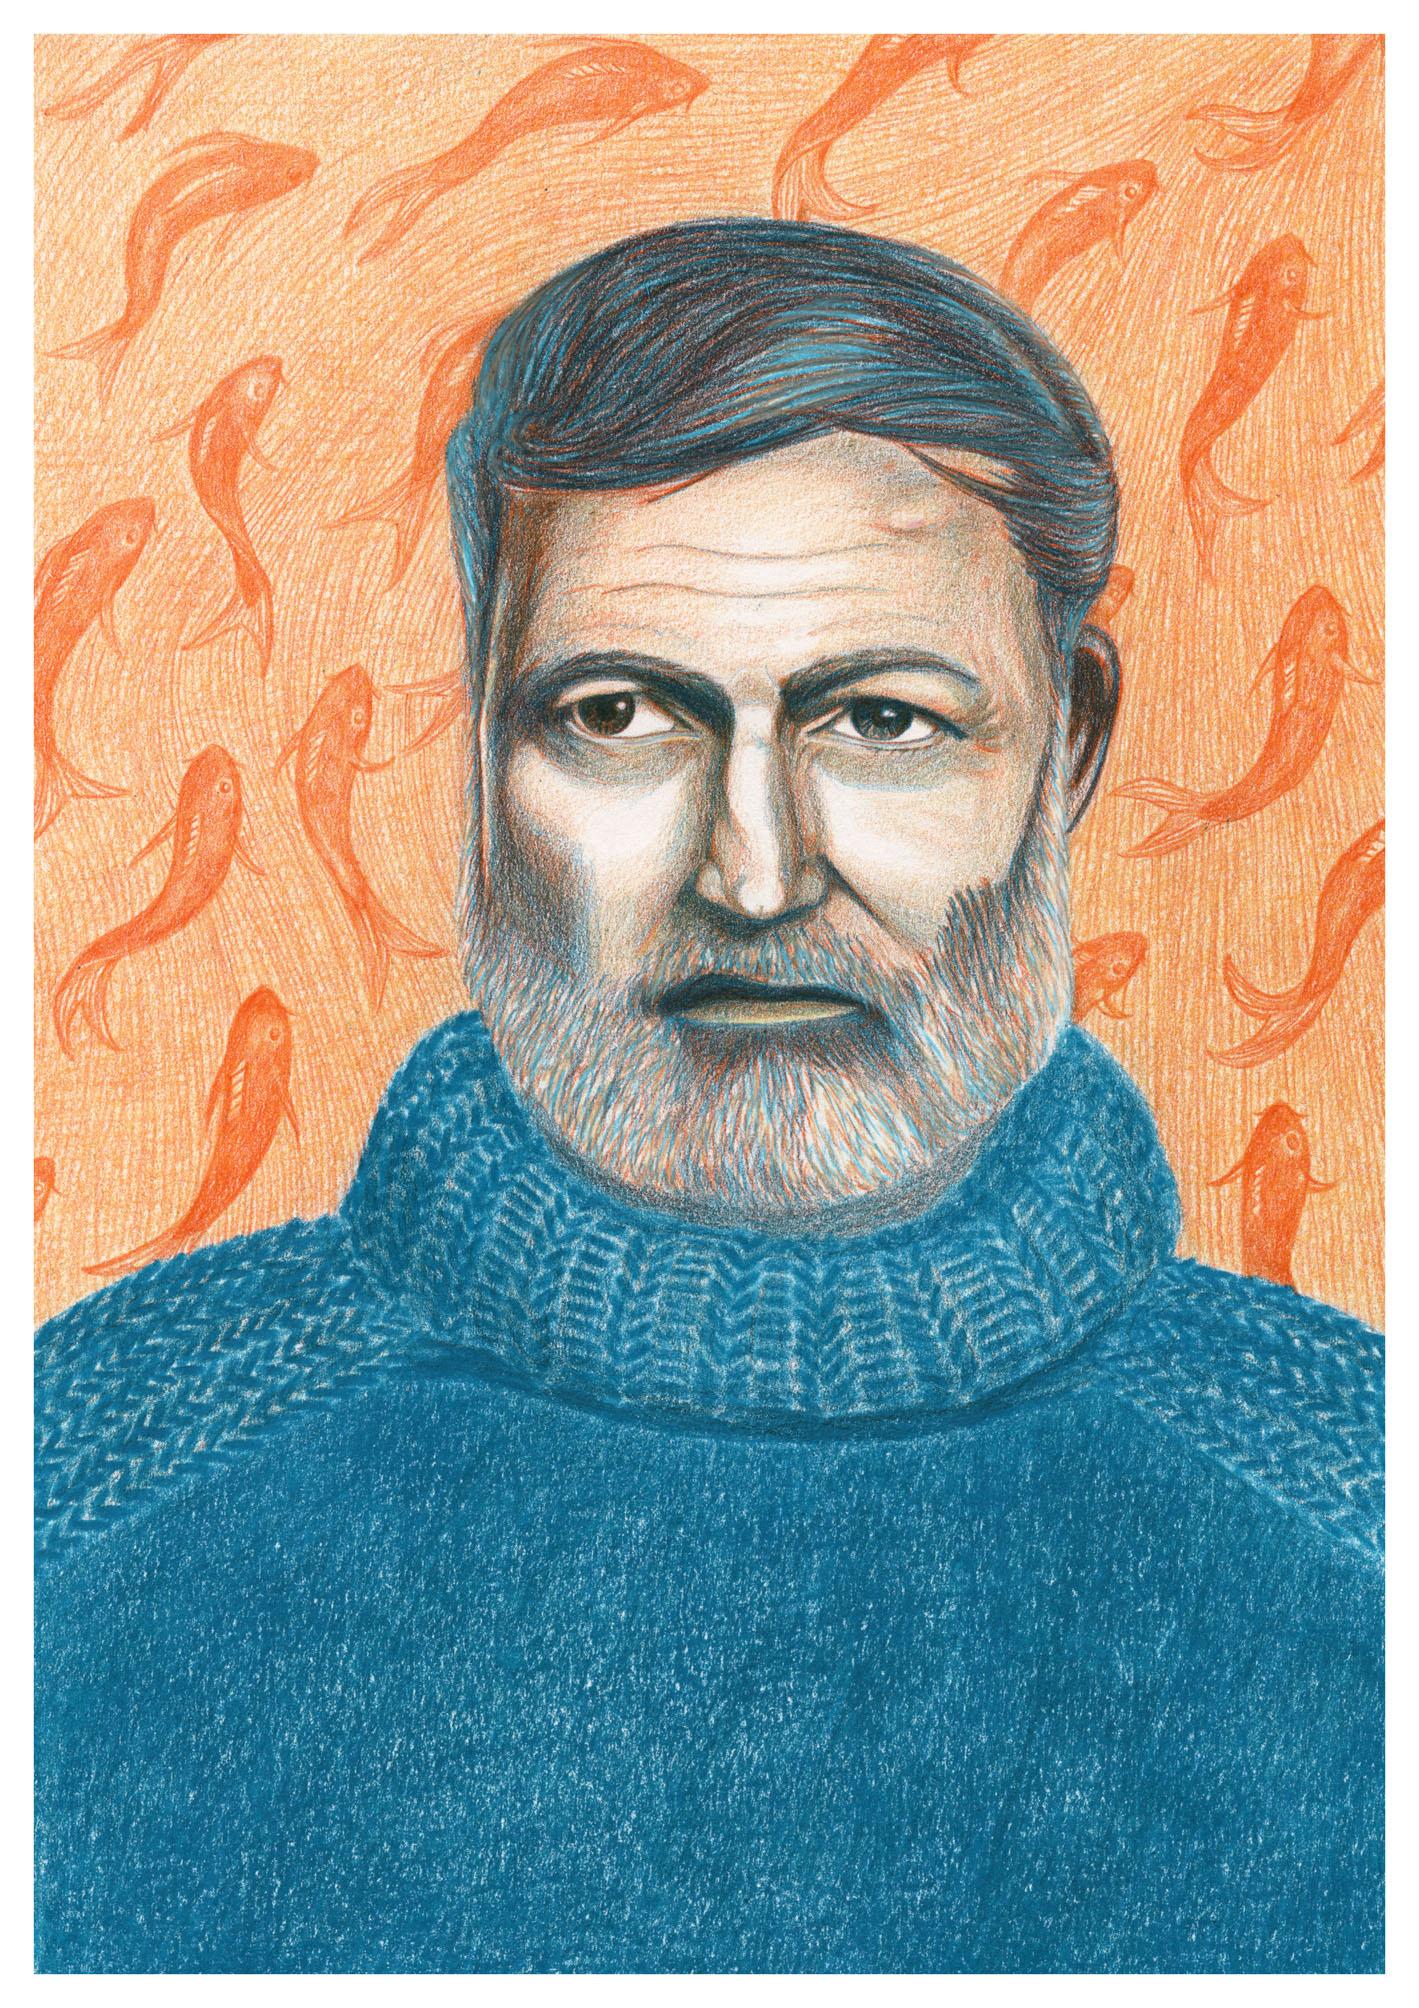 my finished illustration of Ernest Hemingway